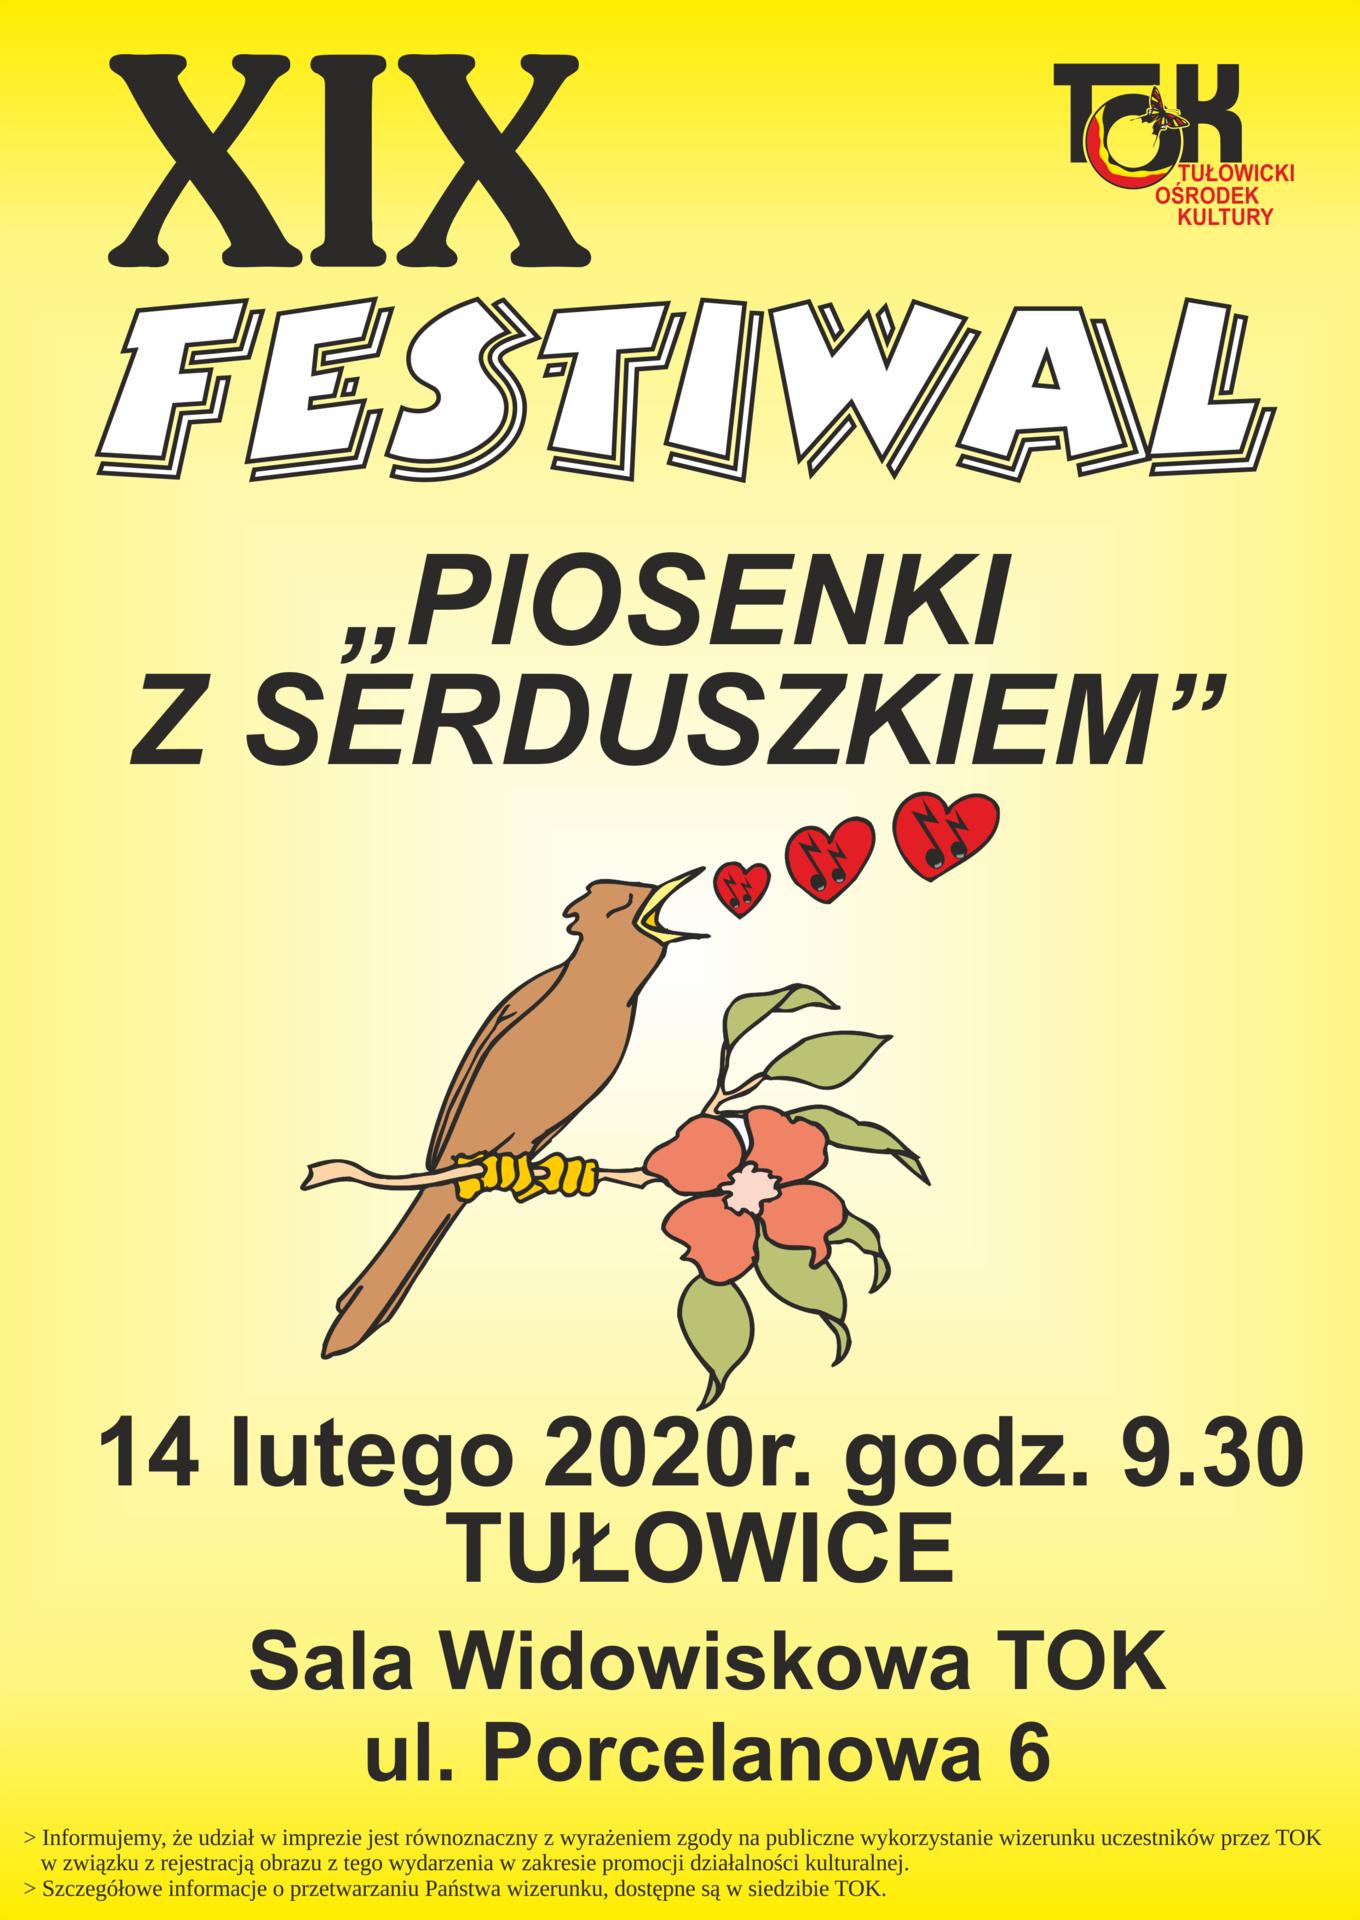 XIX Festiwal Piosenki z Serduszkiem